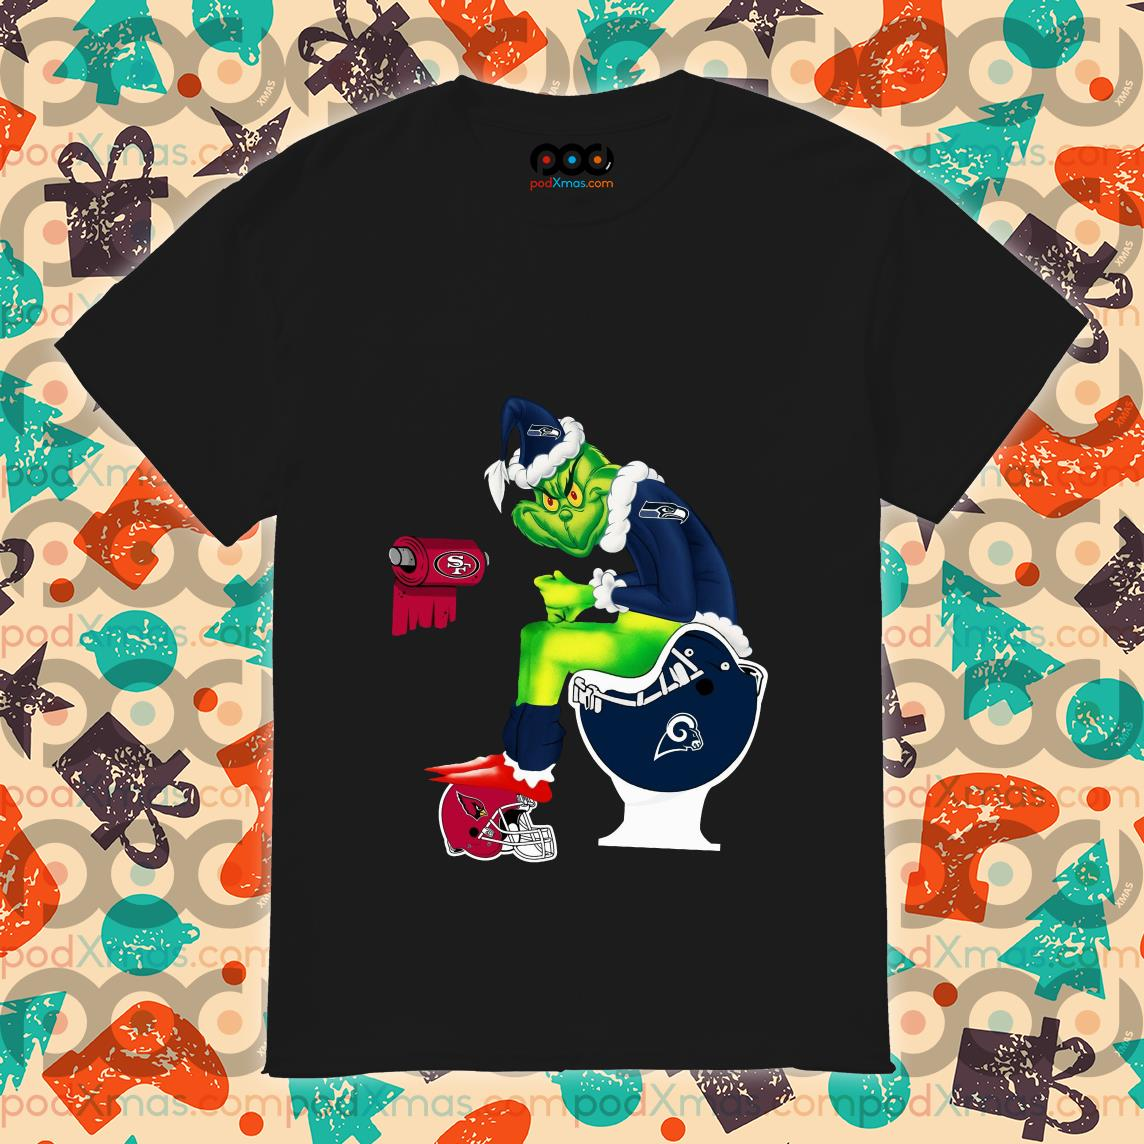 Grinch Seattle Seahawks Los Angeles Rams Arizona Cardinals 49ers shirt